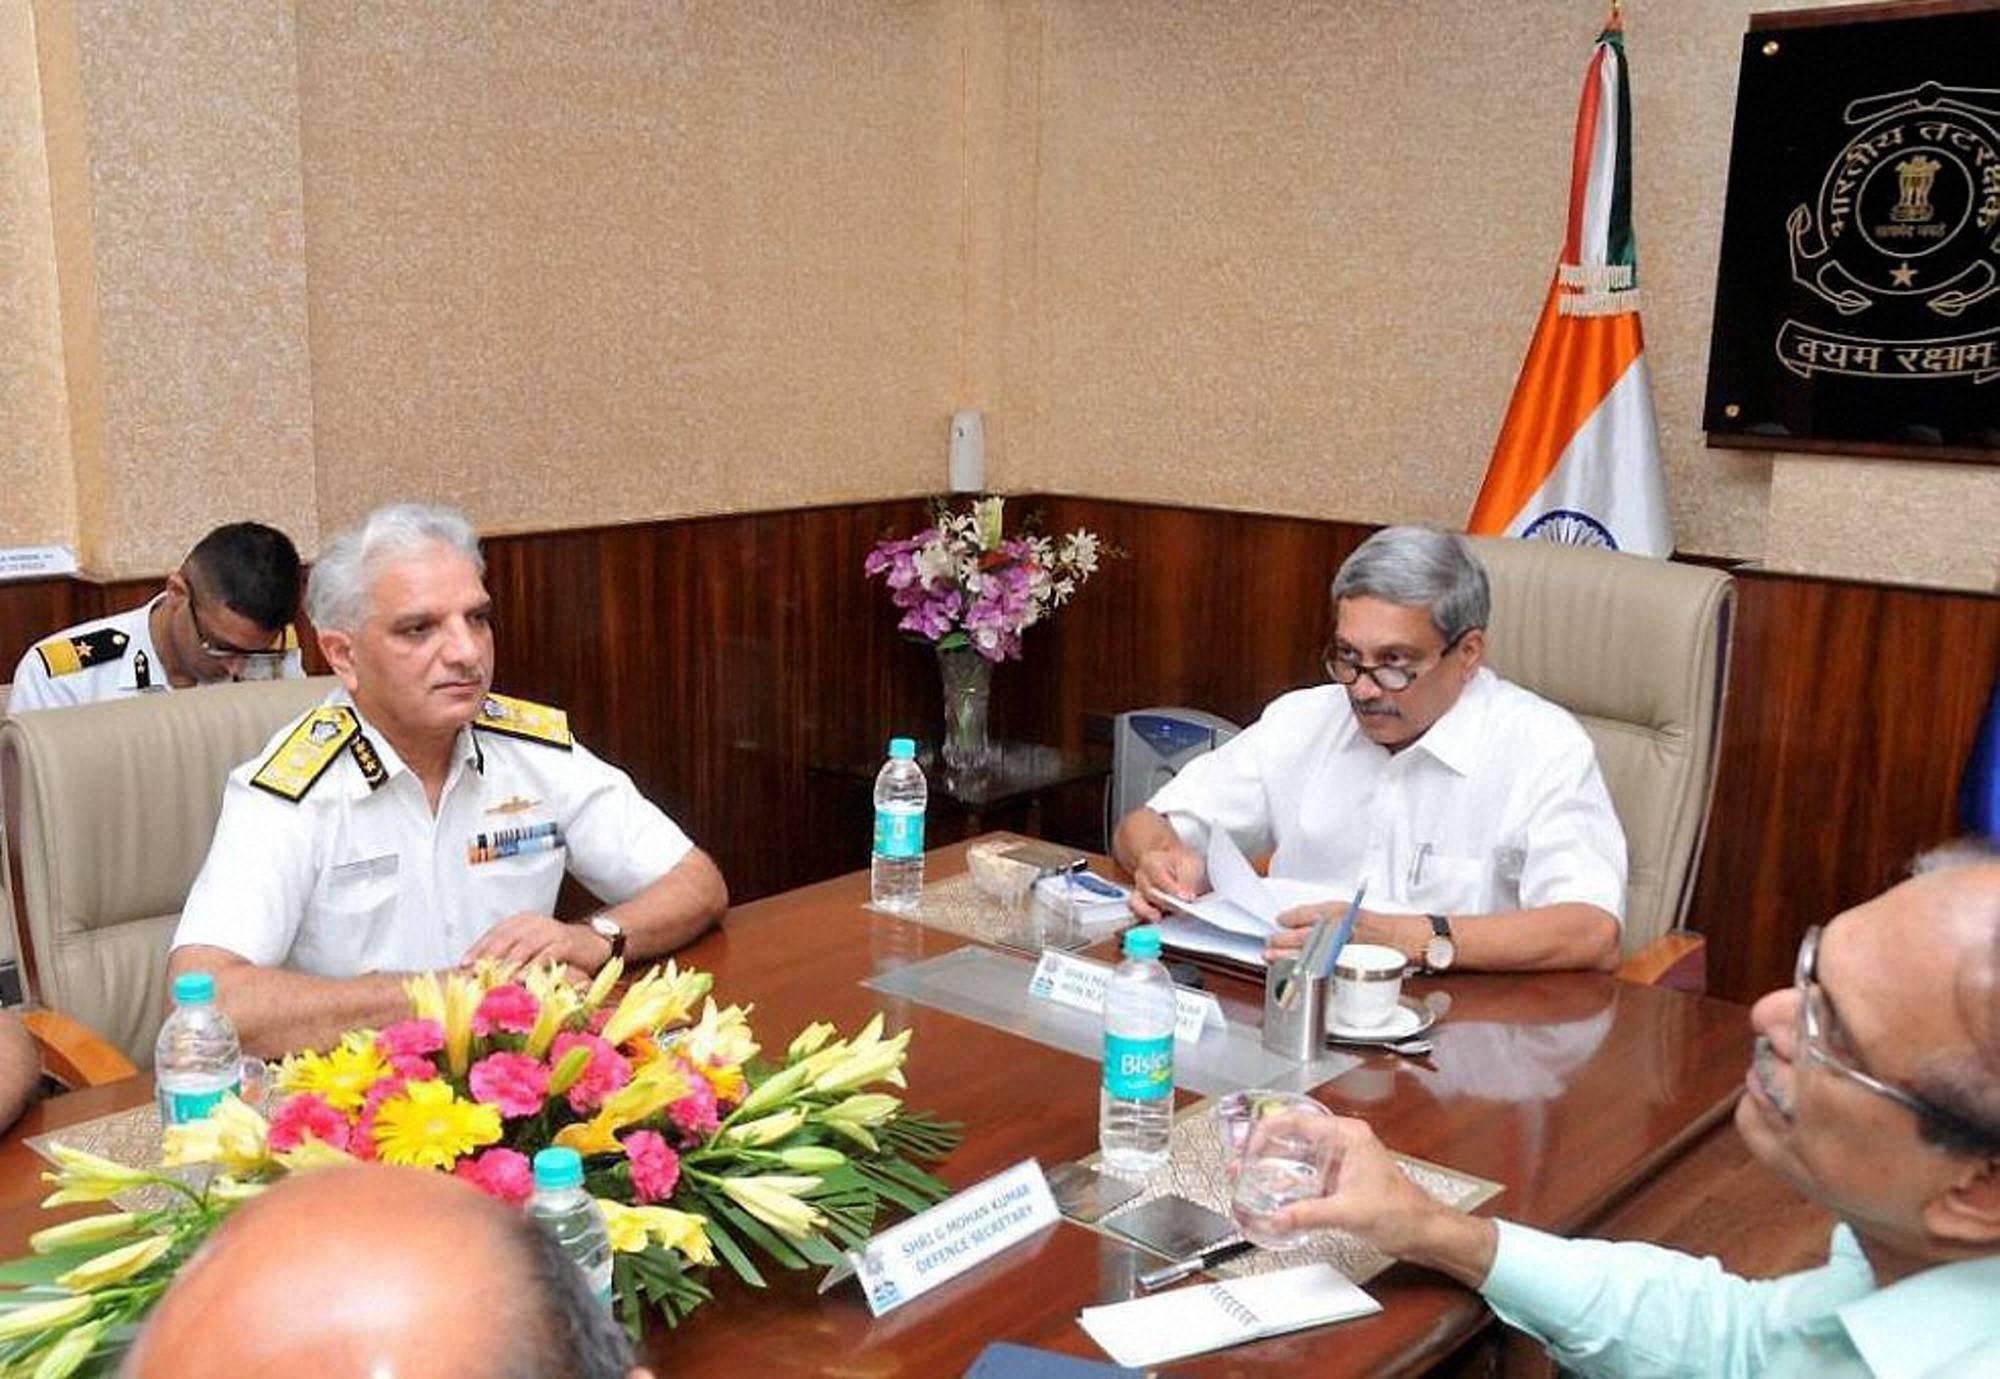 Coast Guard should bolster security to thwart infiltration: Parrikar